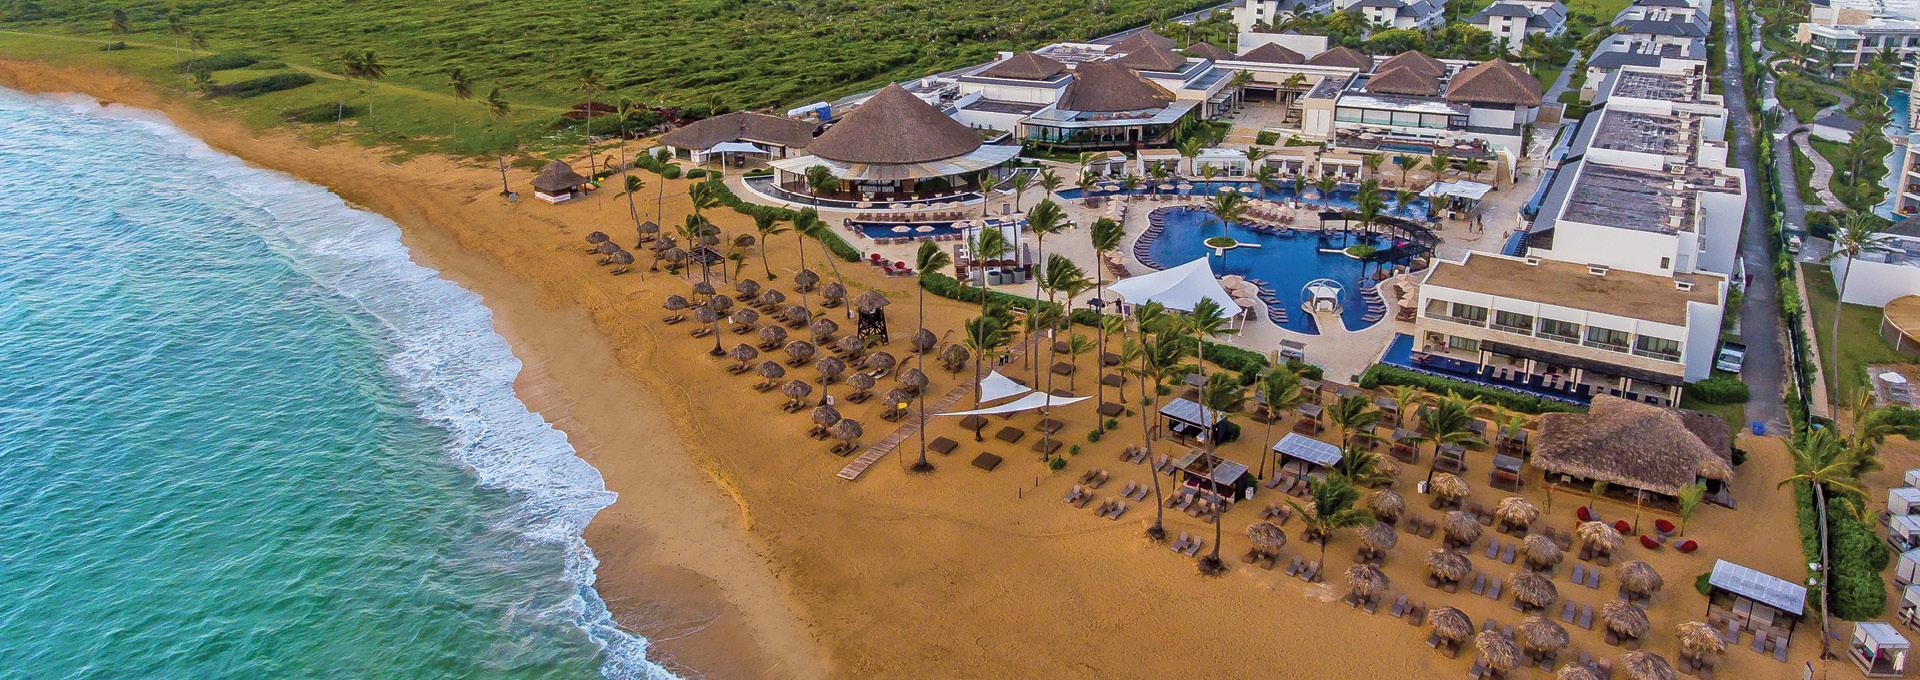 Blue Diamond Resorts aerial view